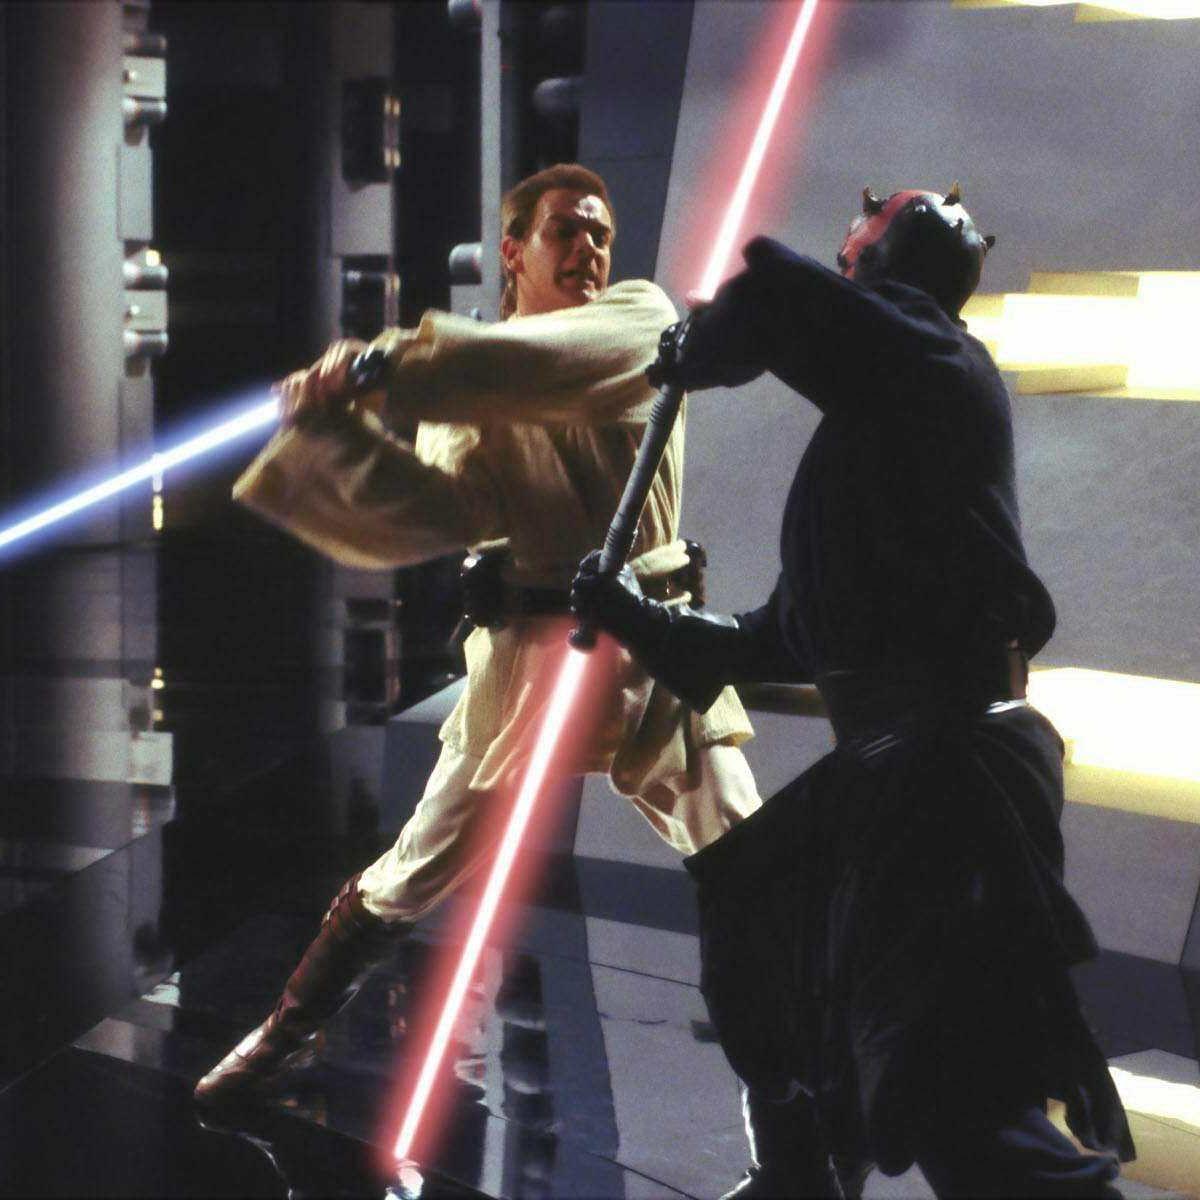 Obi-Wan-vs-Darth-Maul-obi-wan-kenobi-20389080-1600-1200.jpg